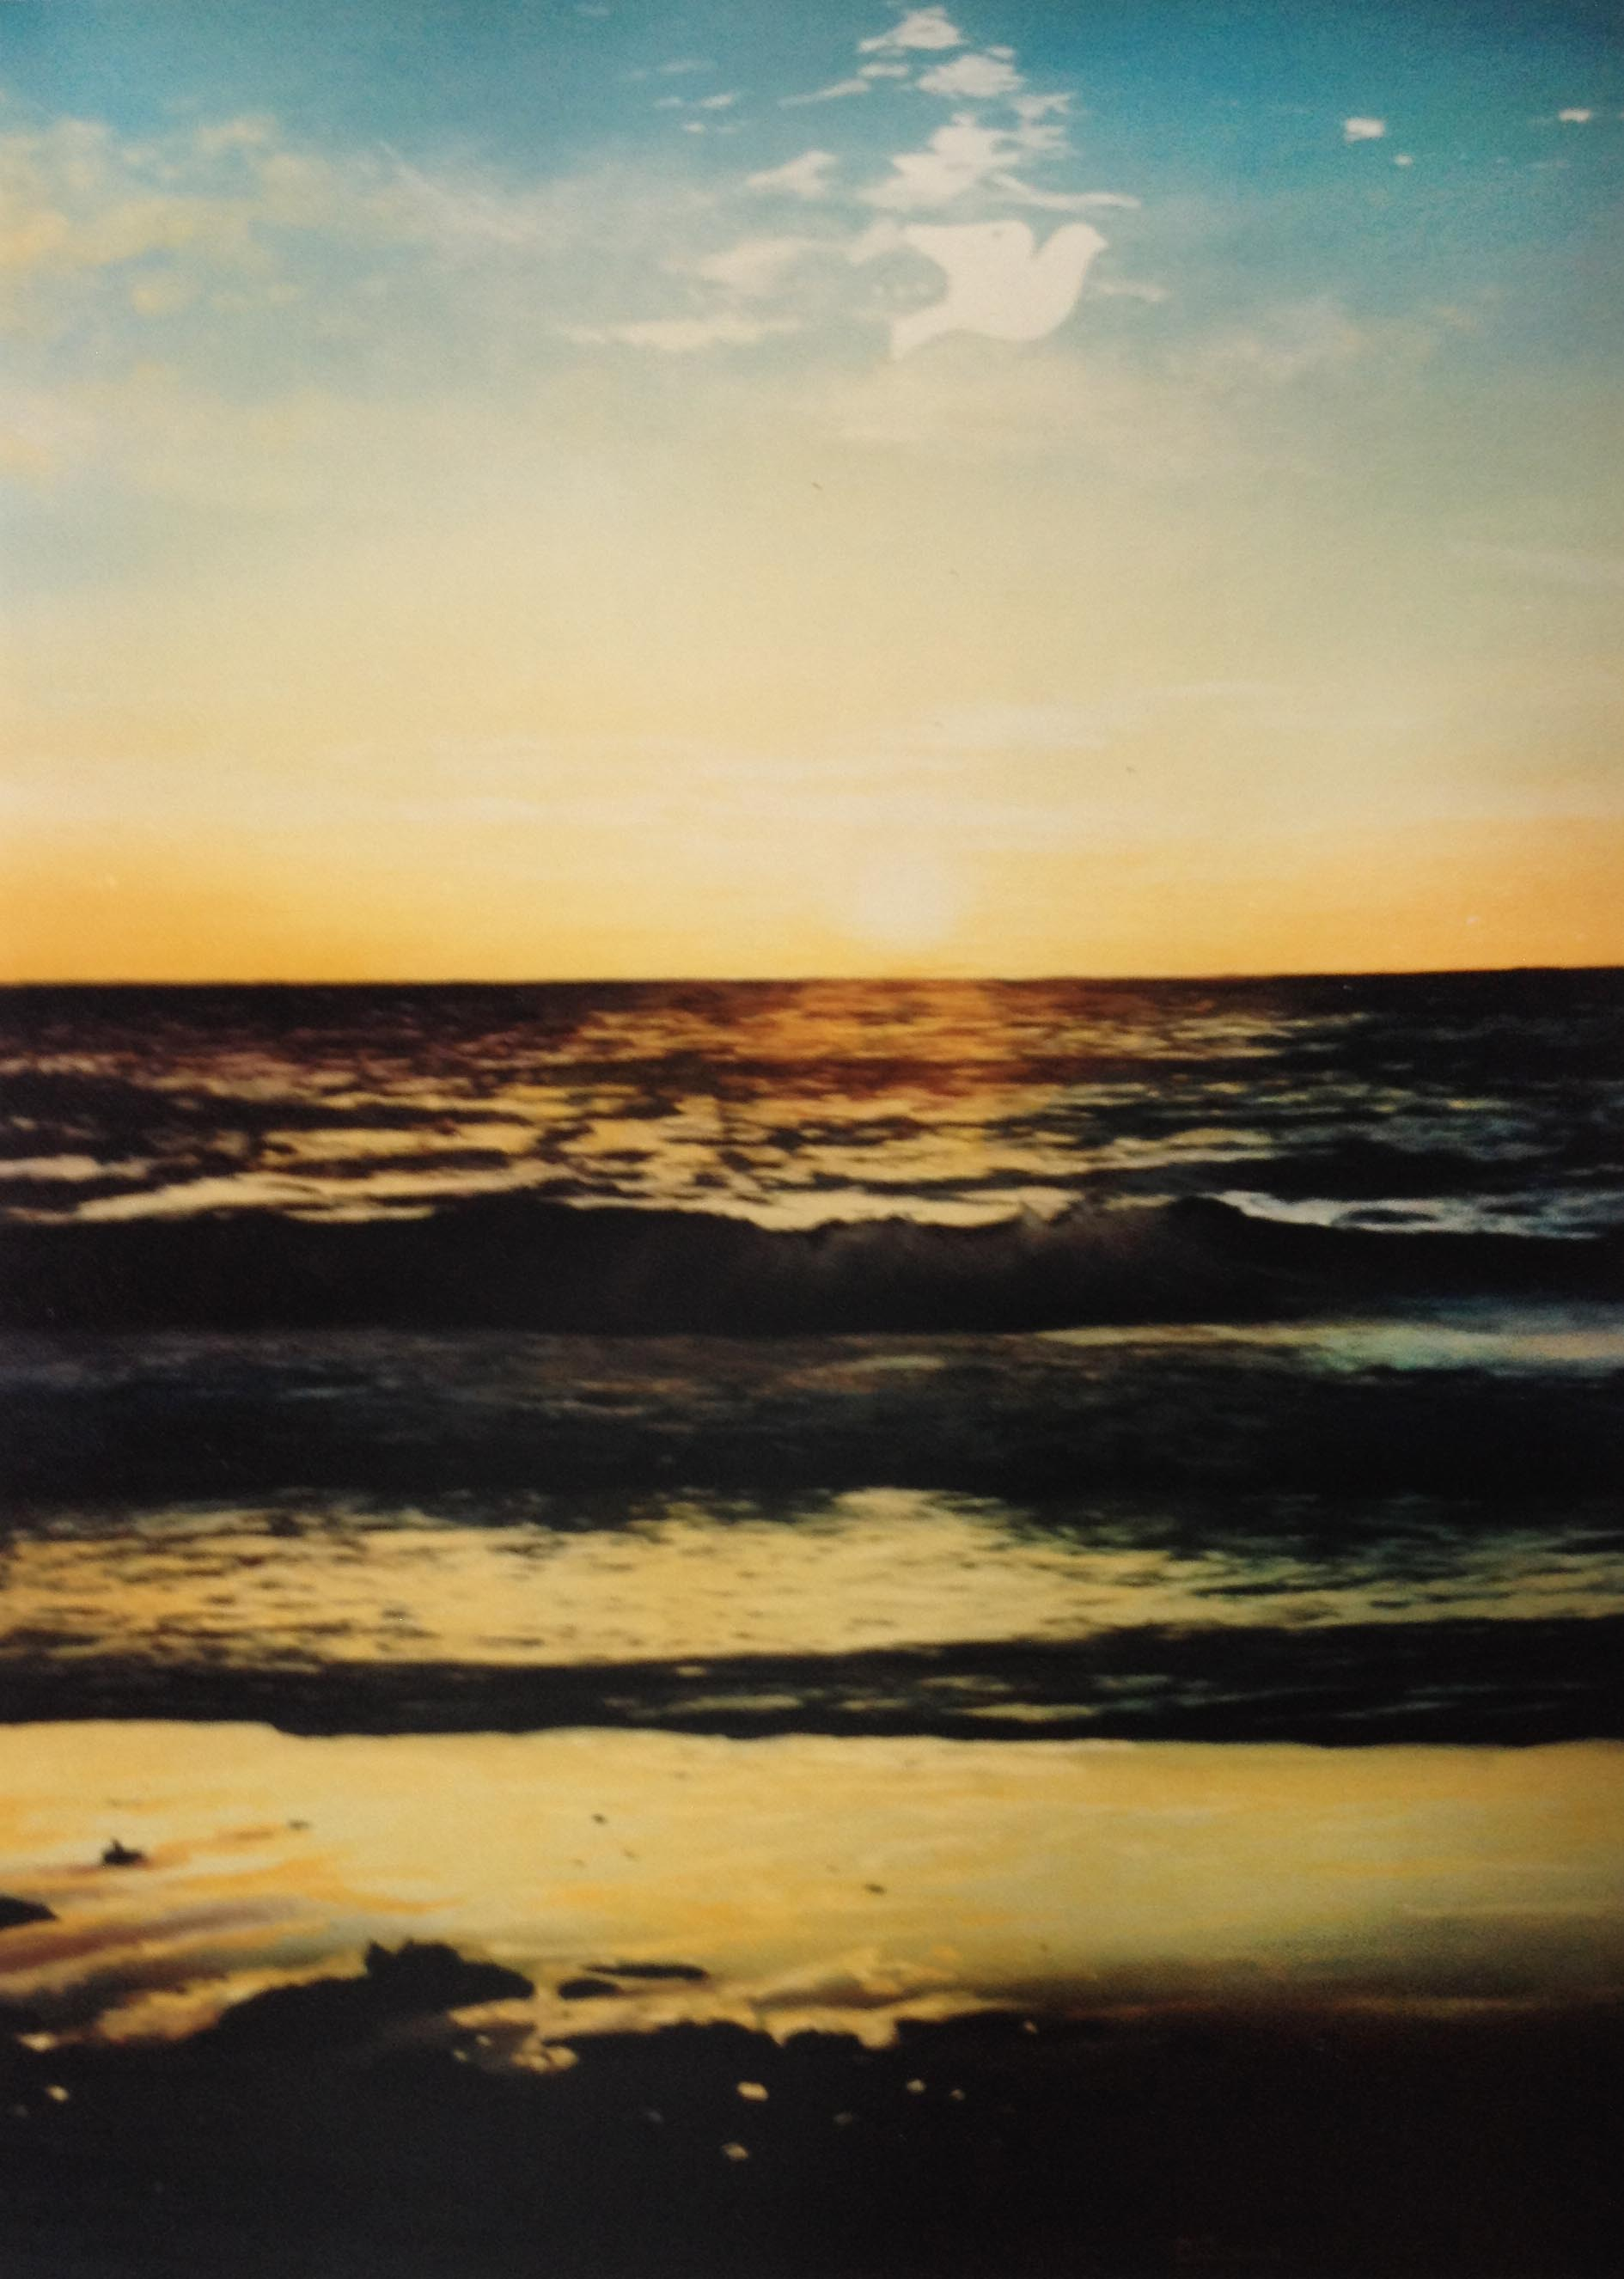 evening shoreline